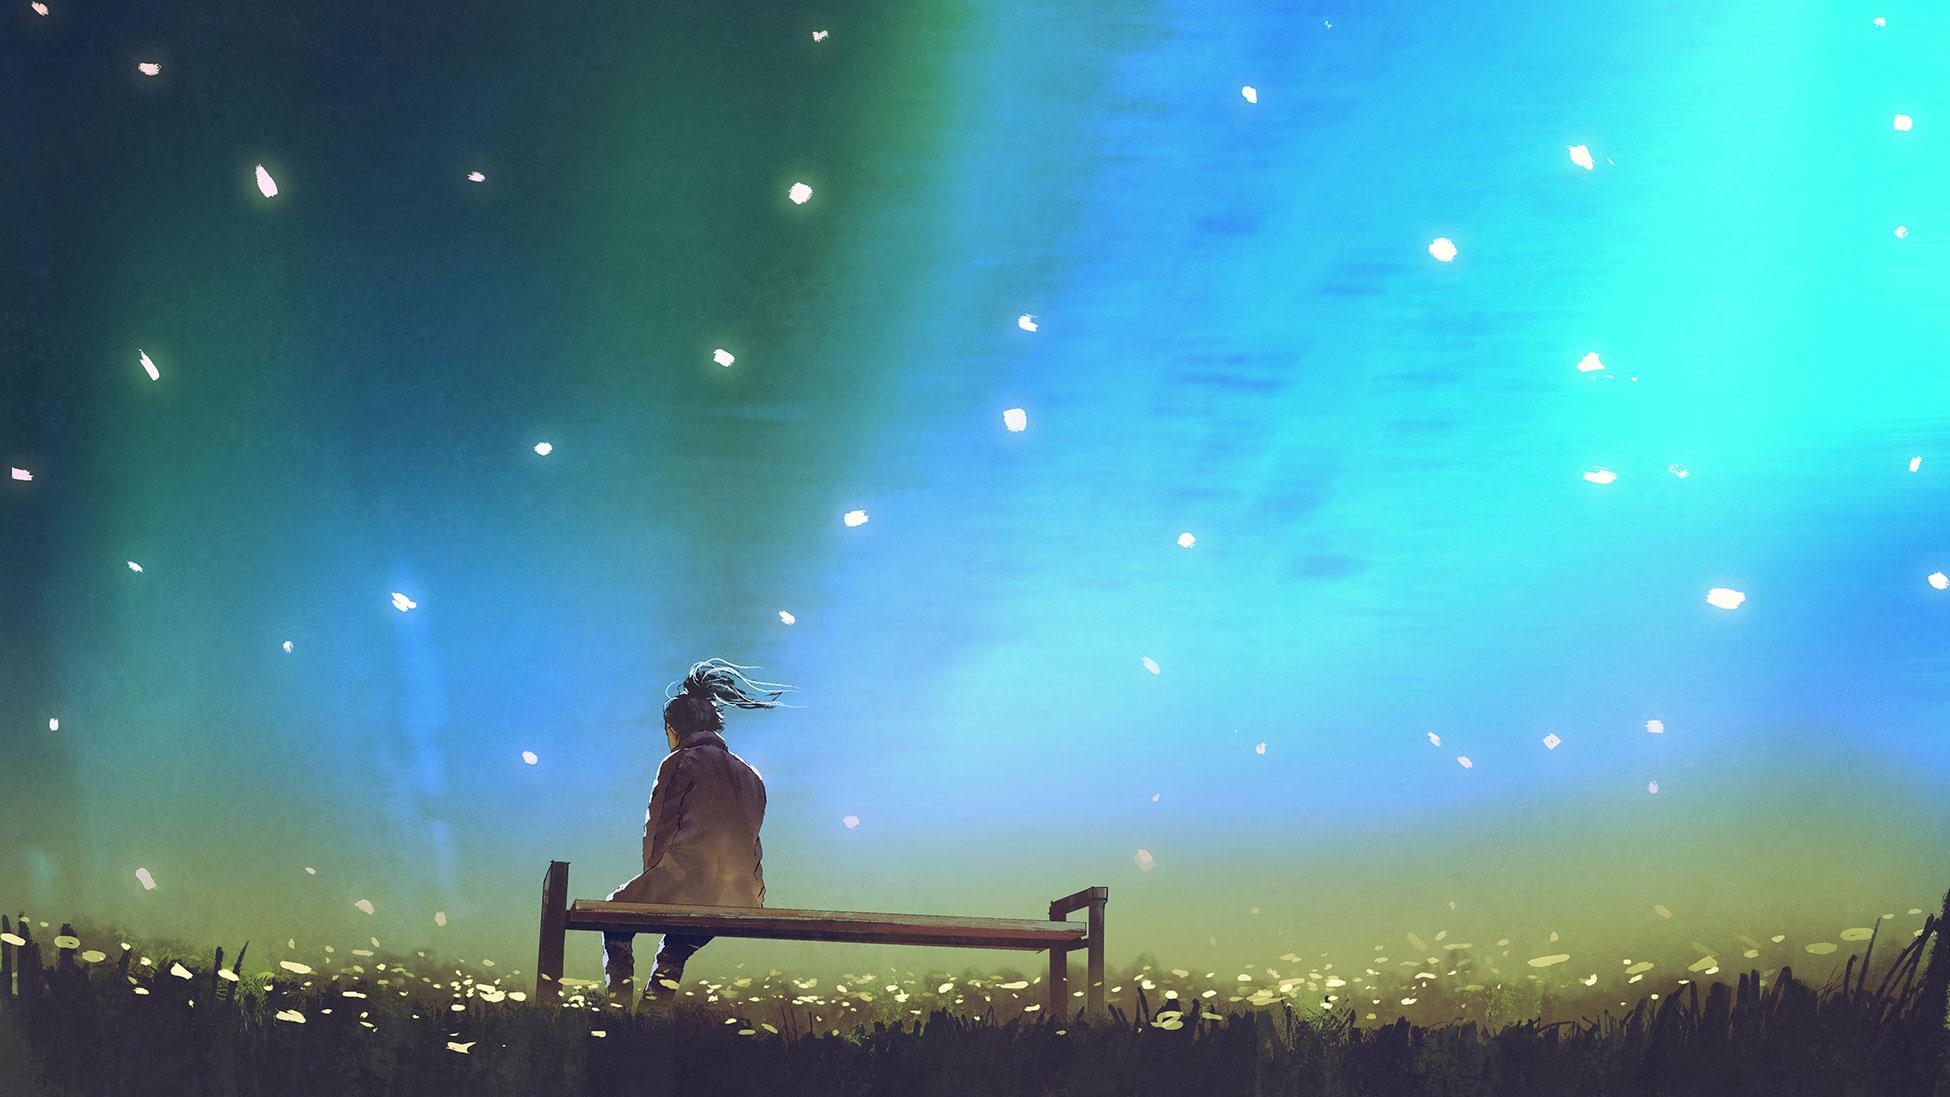 Illustration of teen sitting on bench under stars